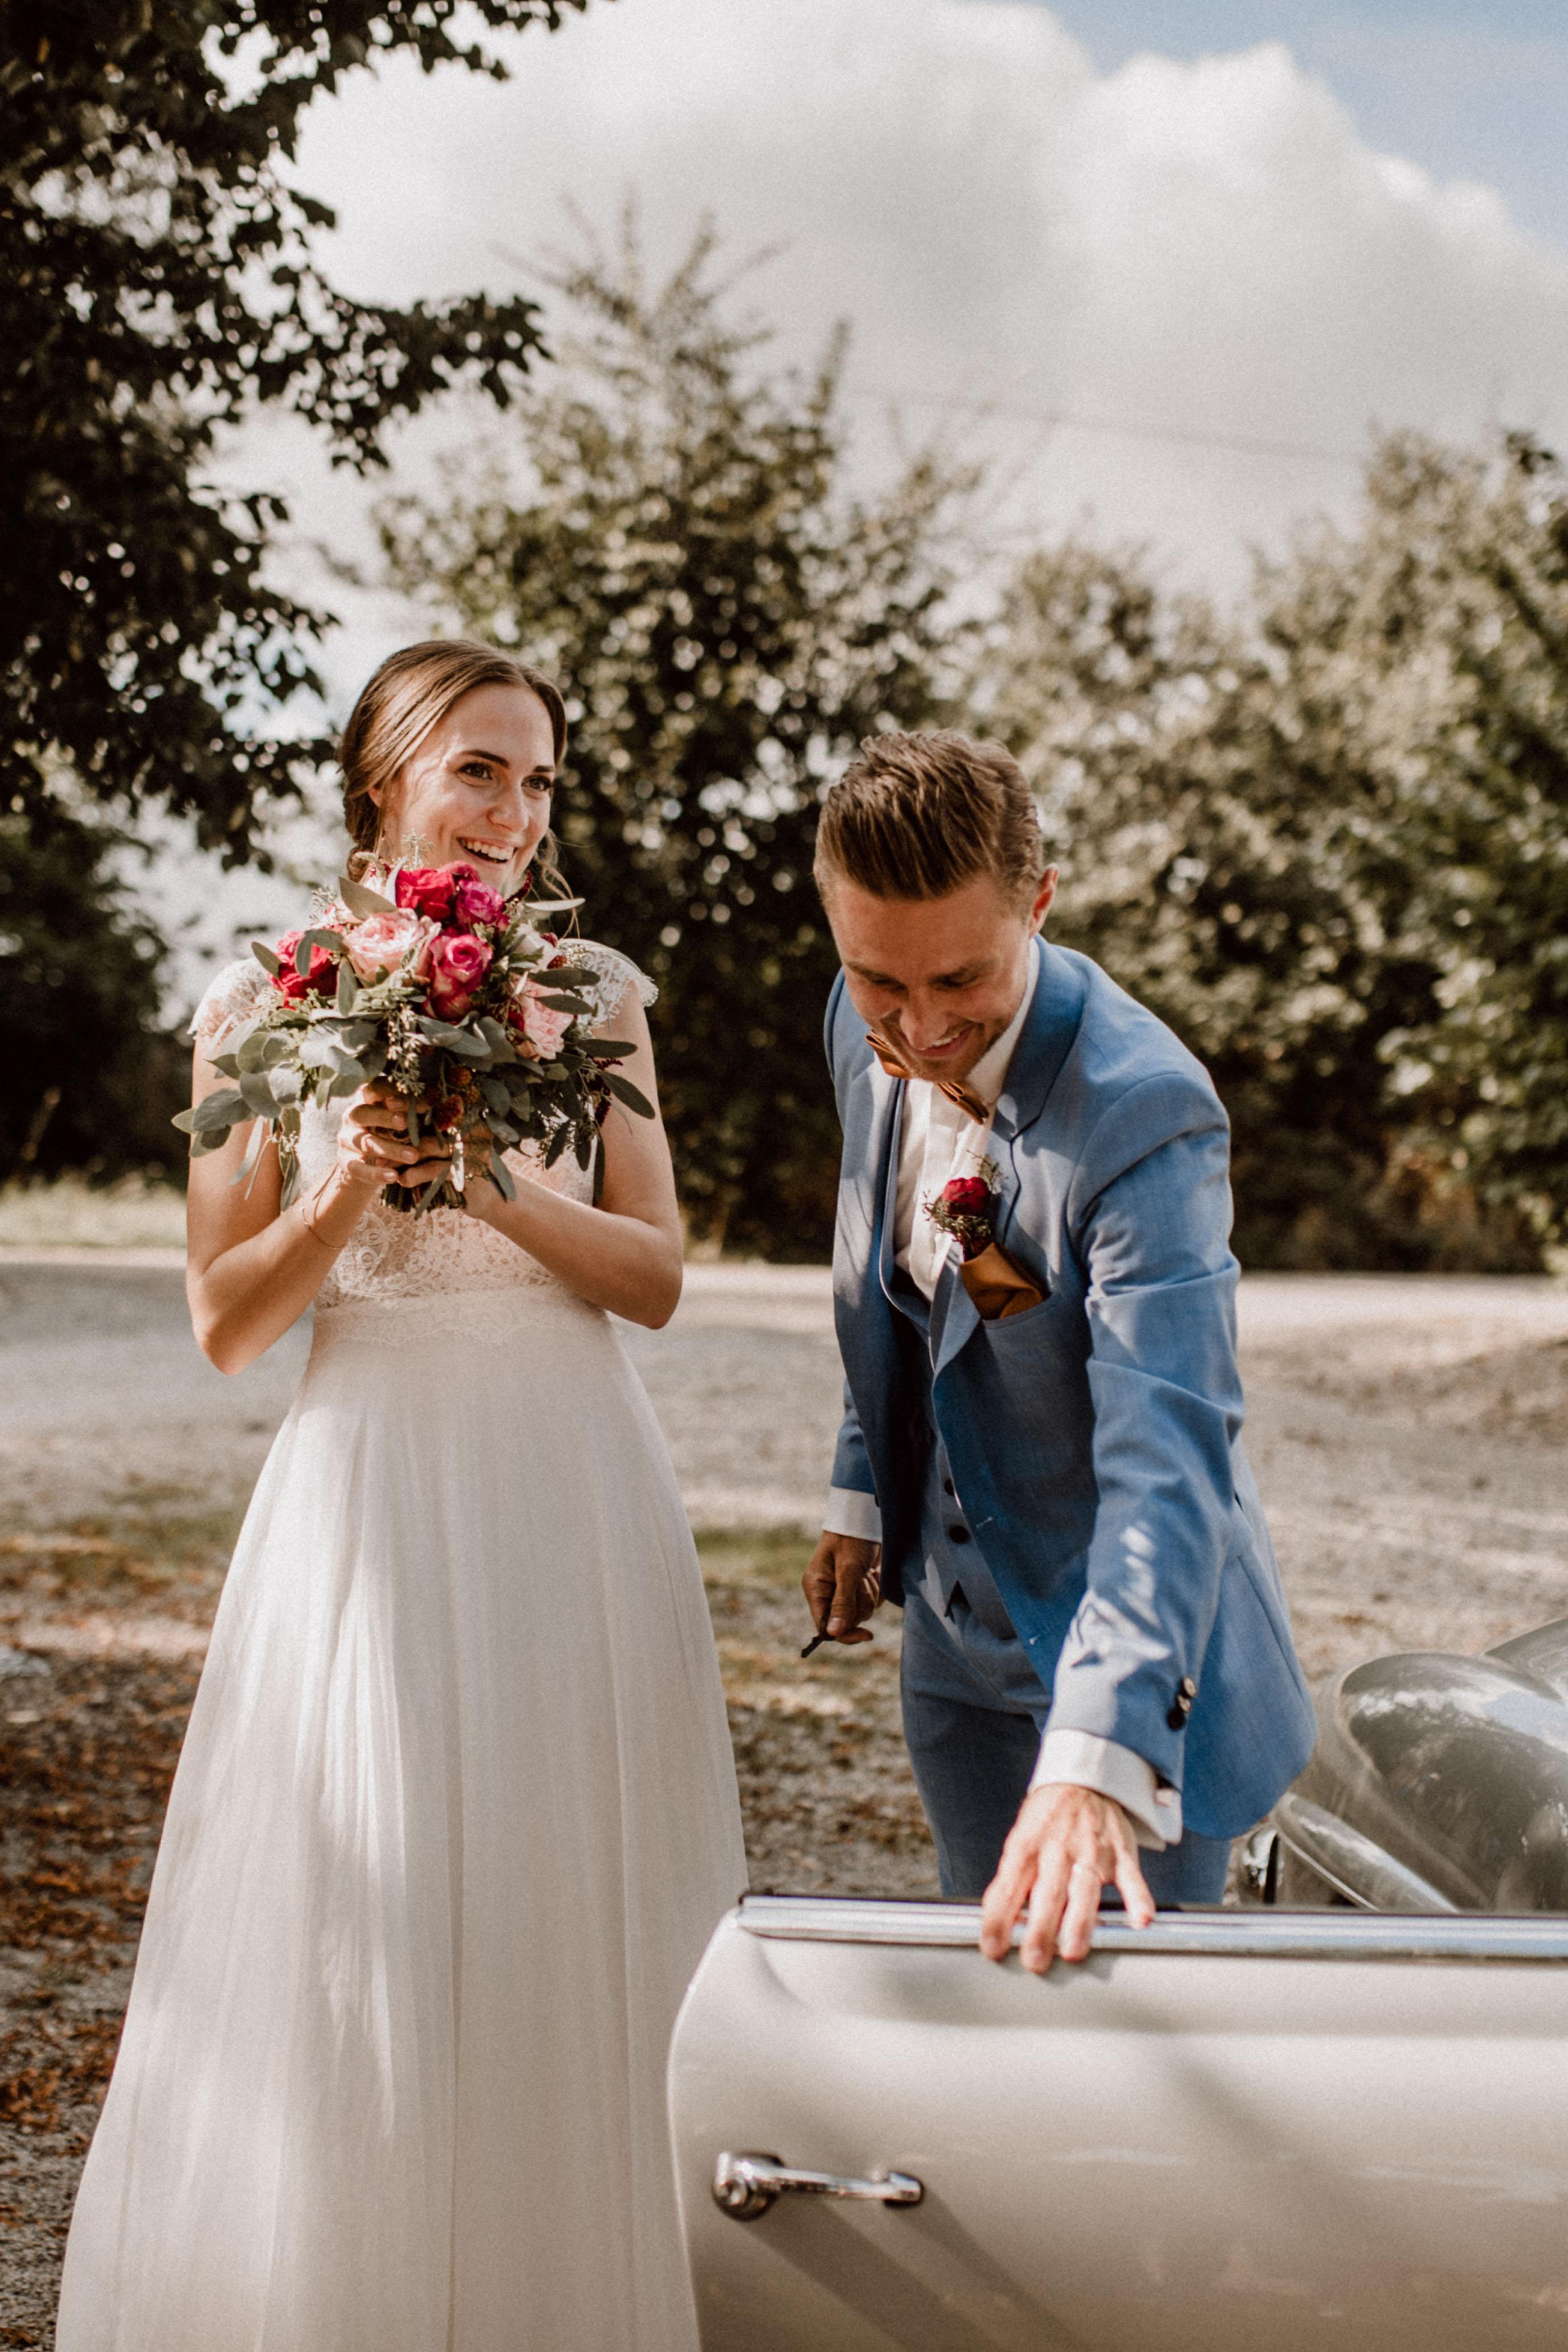 sektempfang sonja poehlmann photography couples muenchen bayern